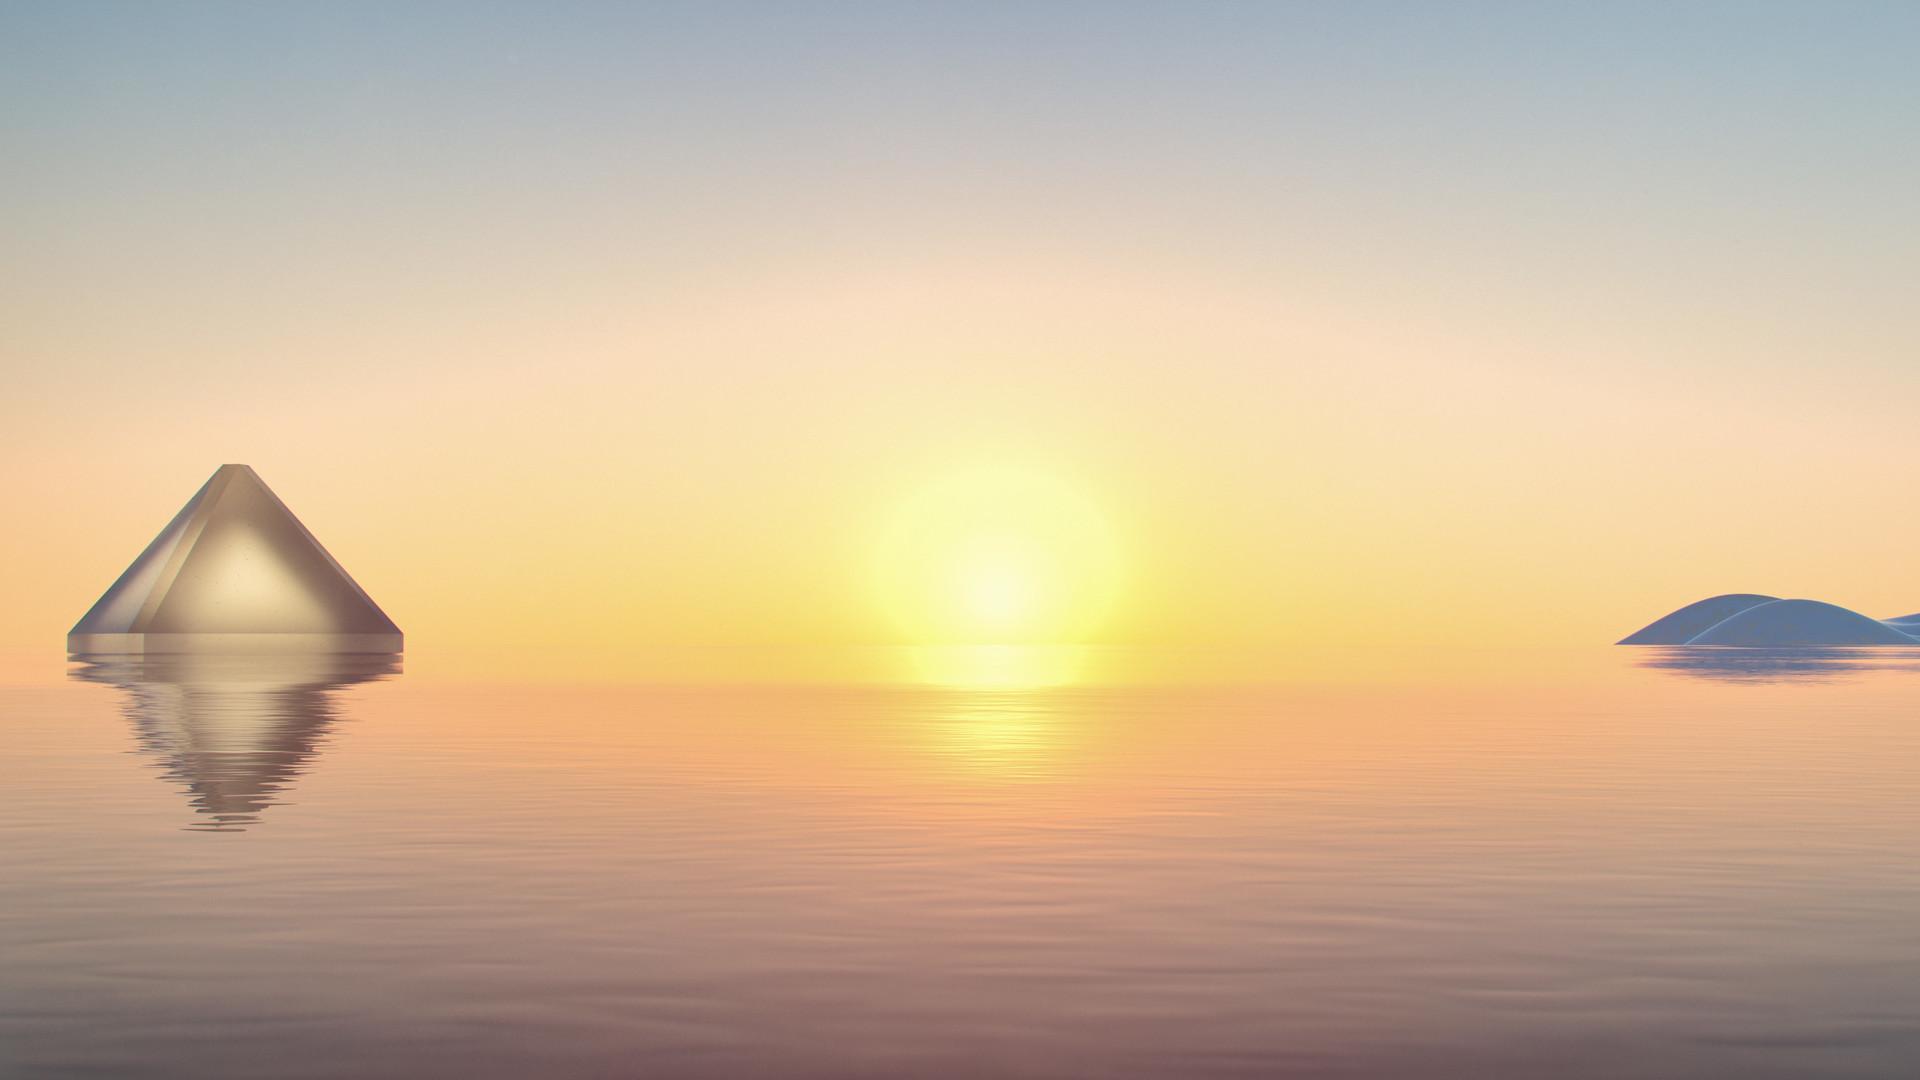 Kresimir jelusic robob3ar sunrise ps